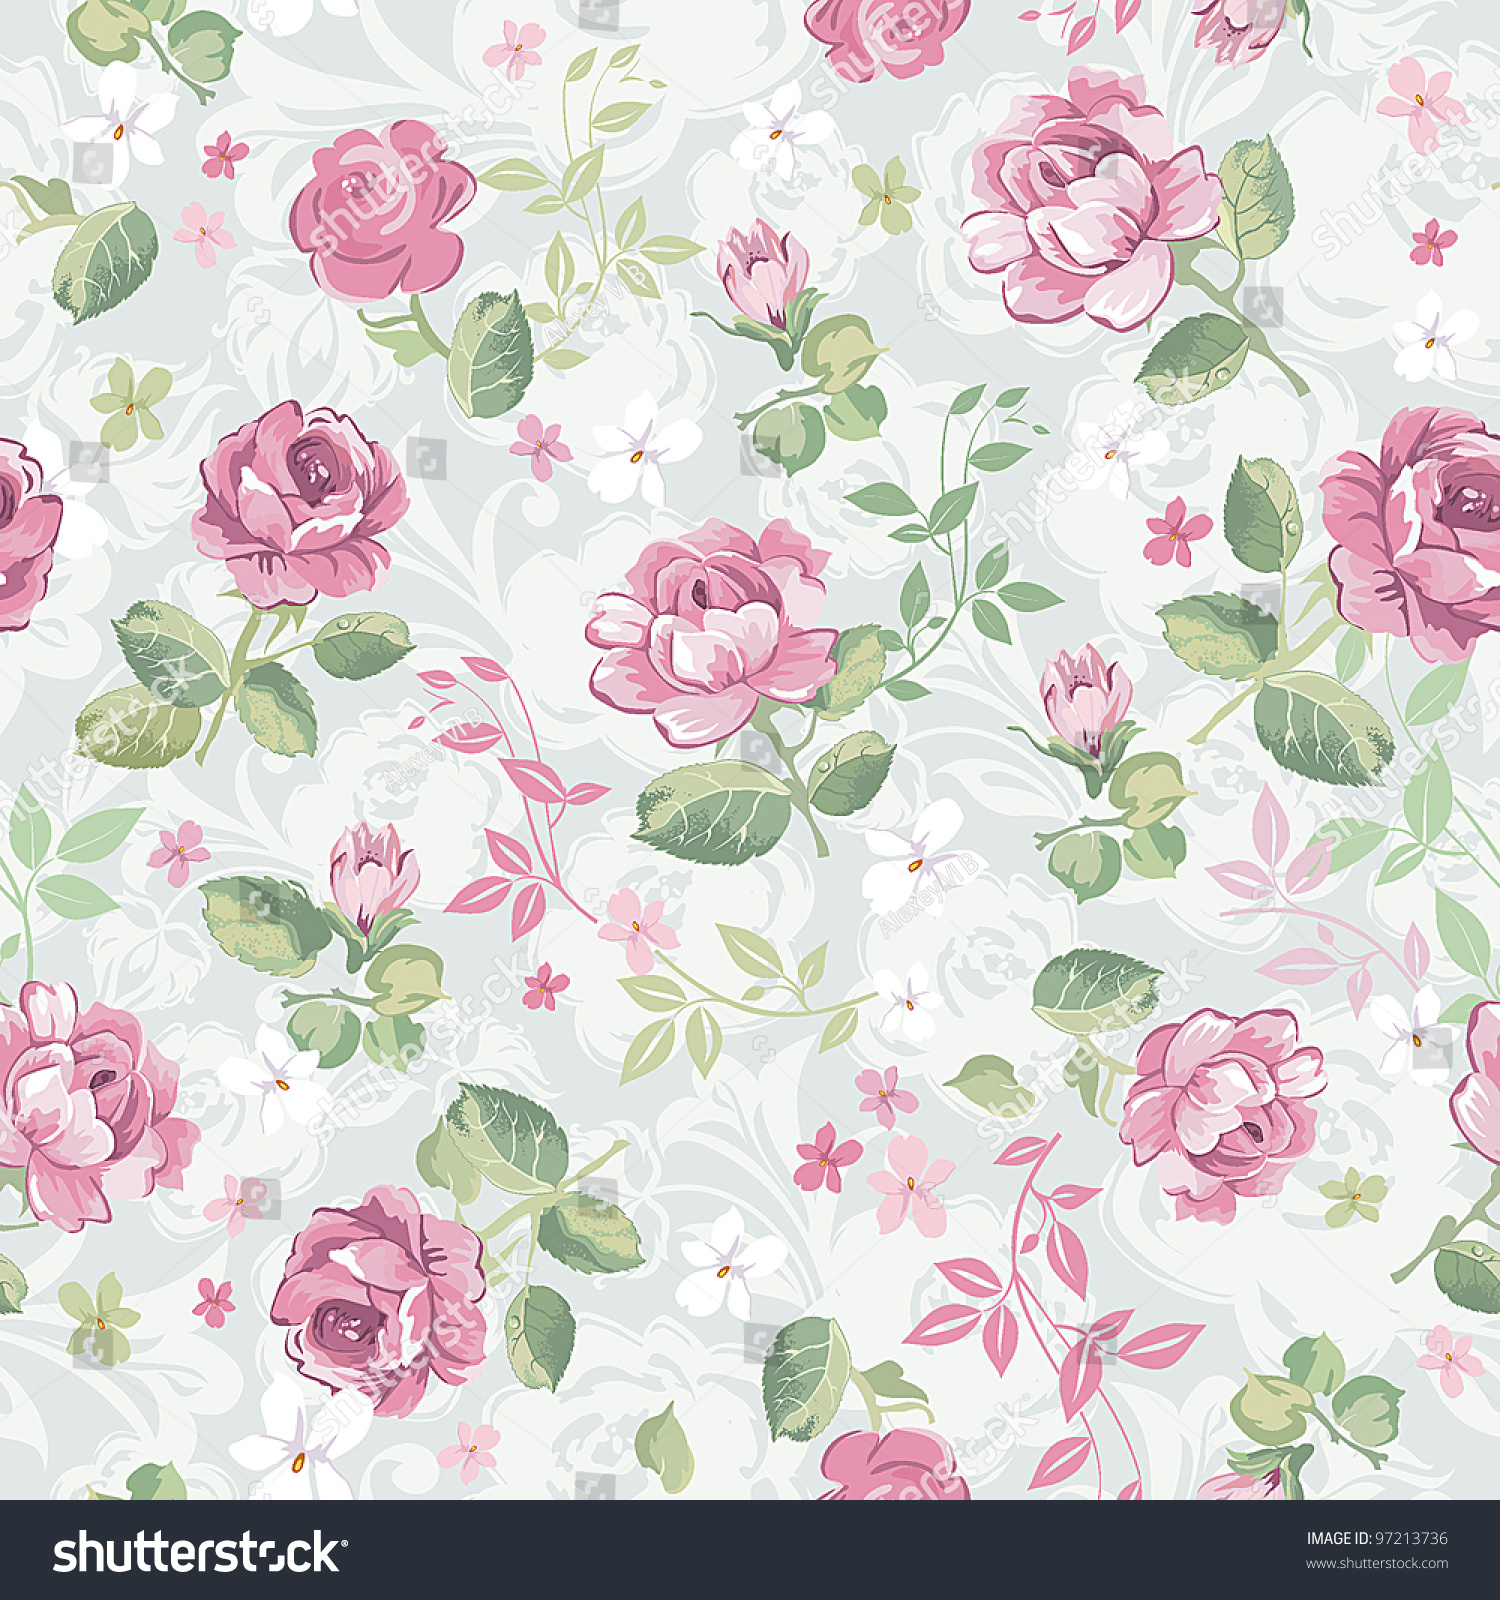 40 beautiful floral textures - photo #37